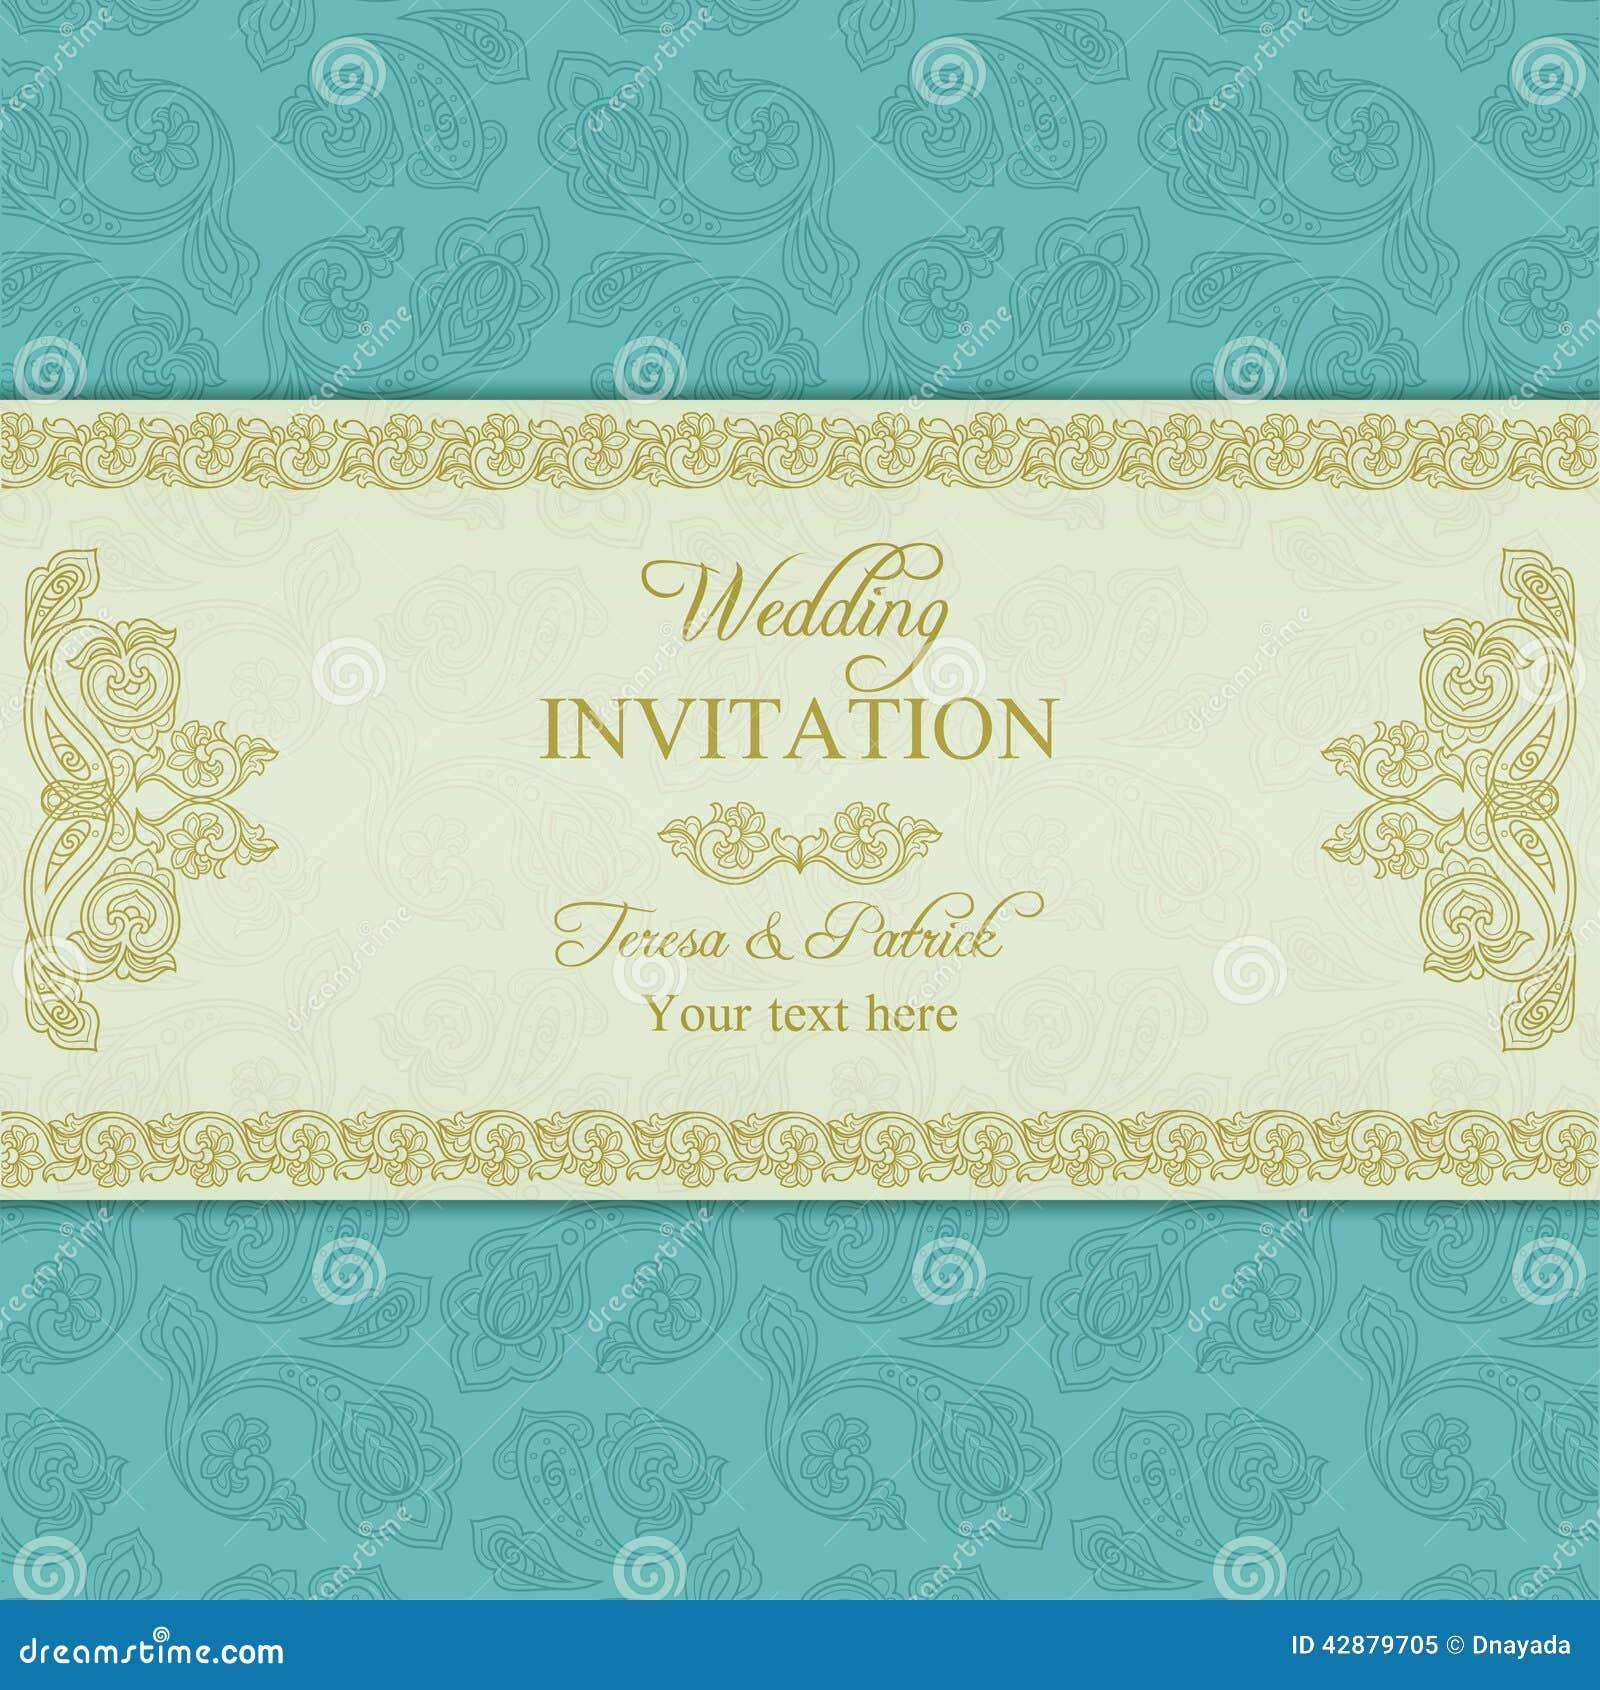 Turkish Cucumber Wedding Invitation Gold And Blue Stock Vector Illustration Of Decorative